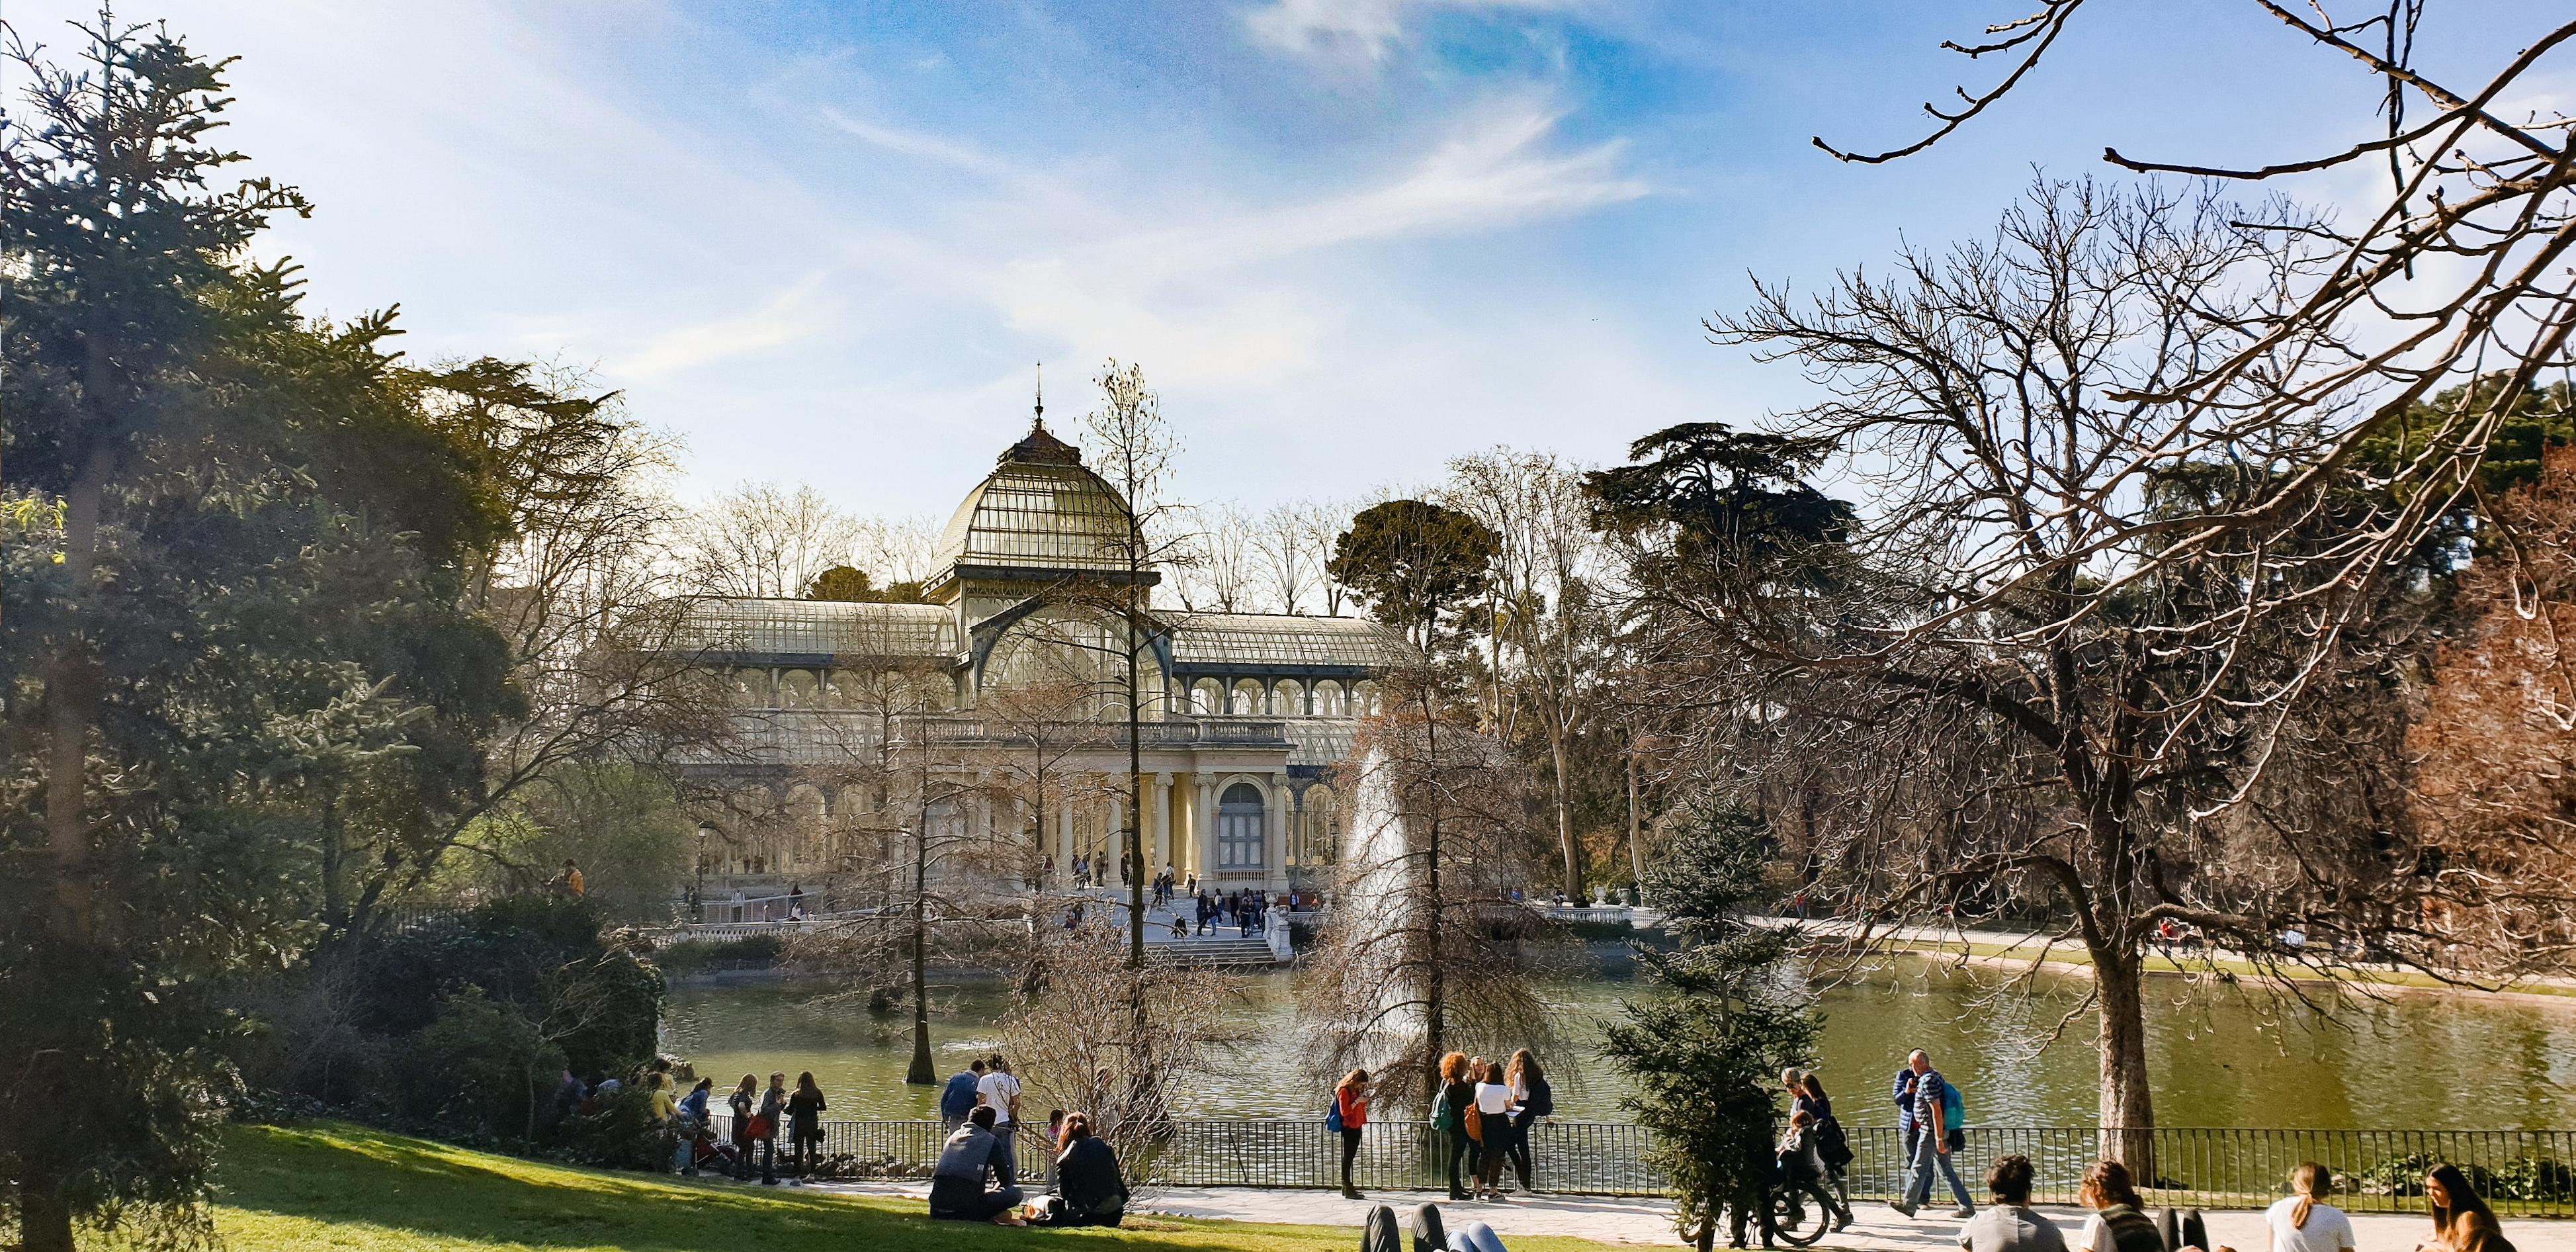 El Palacio de Cristal Retiro Park